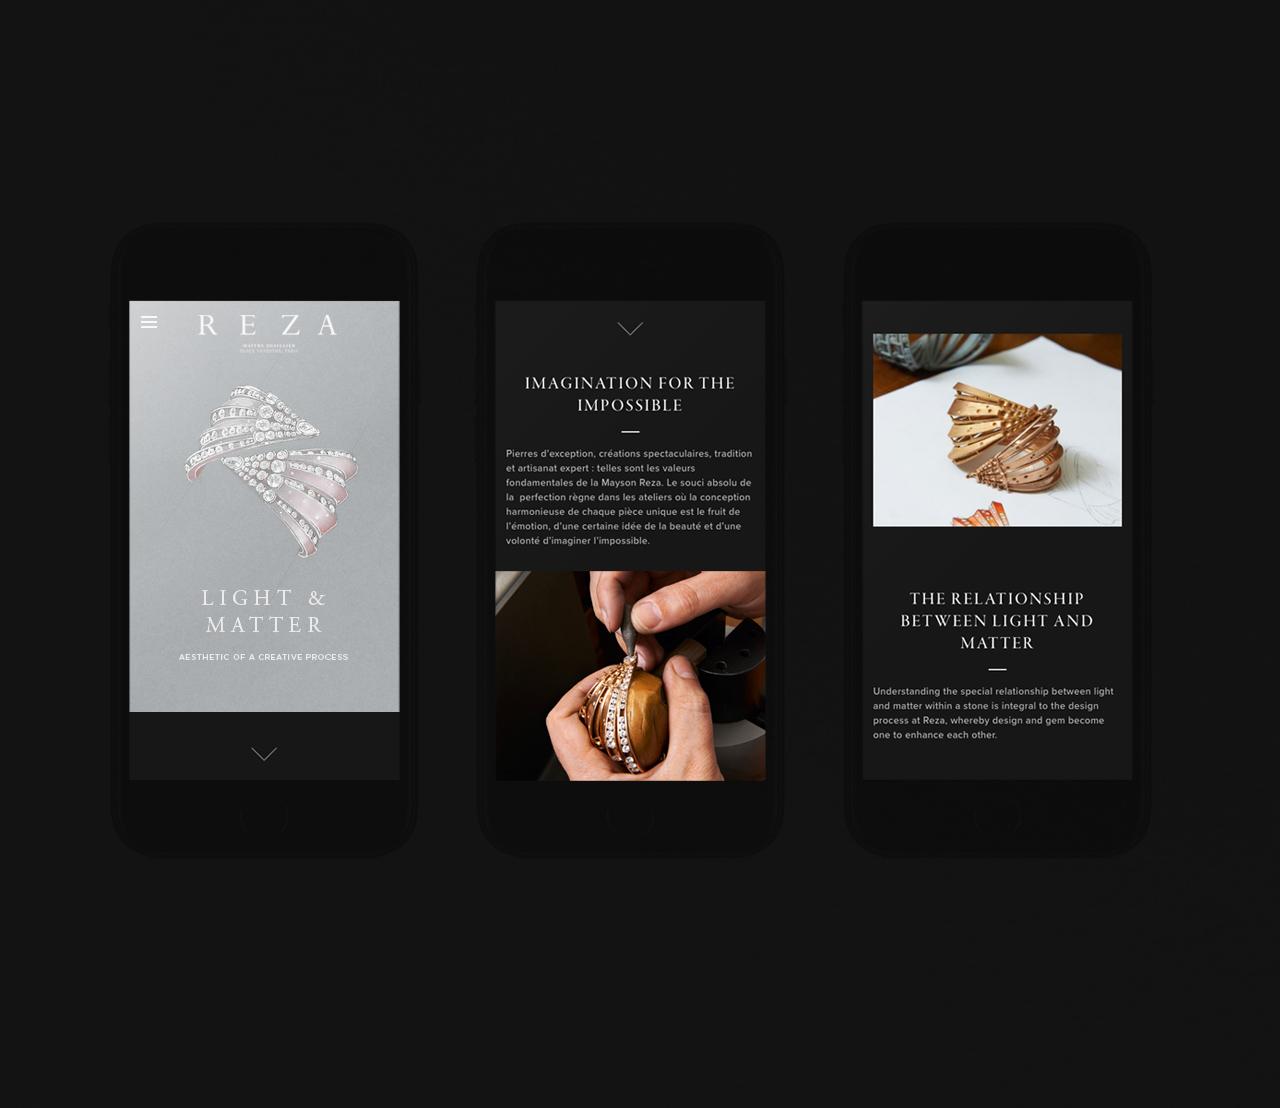 REZA-aesthetic-mobile.jpg